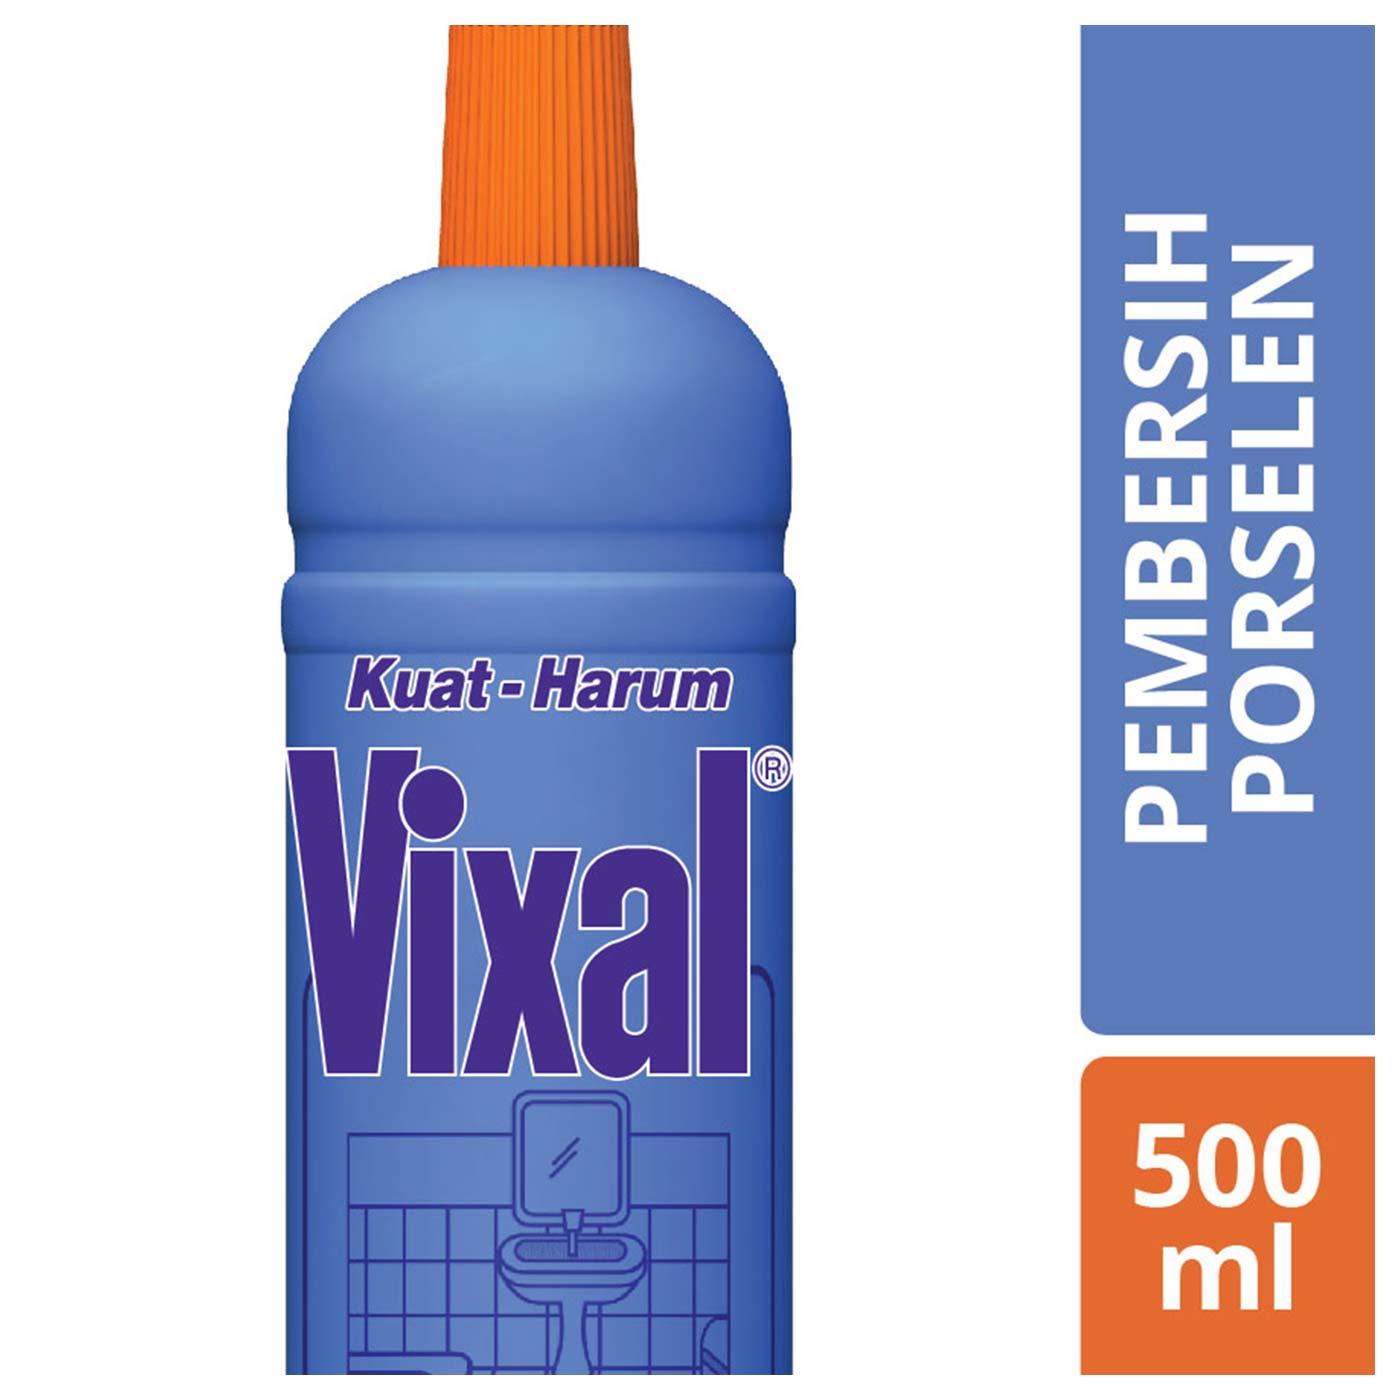 Vixal Porcelain Cleaner Blue Btl (500mL)